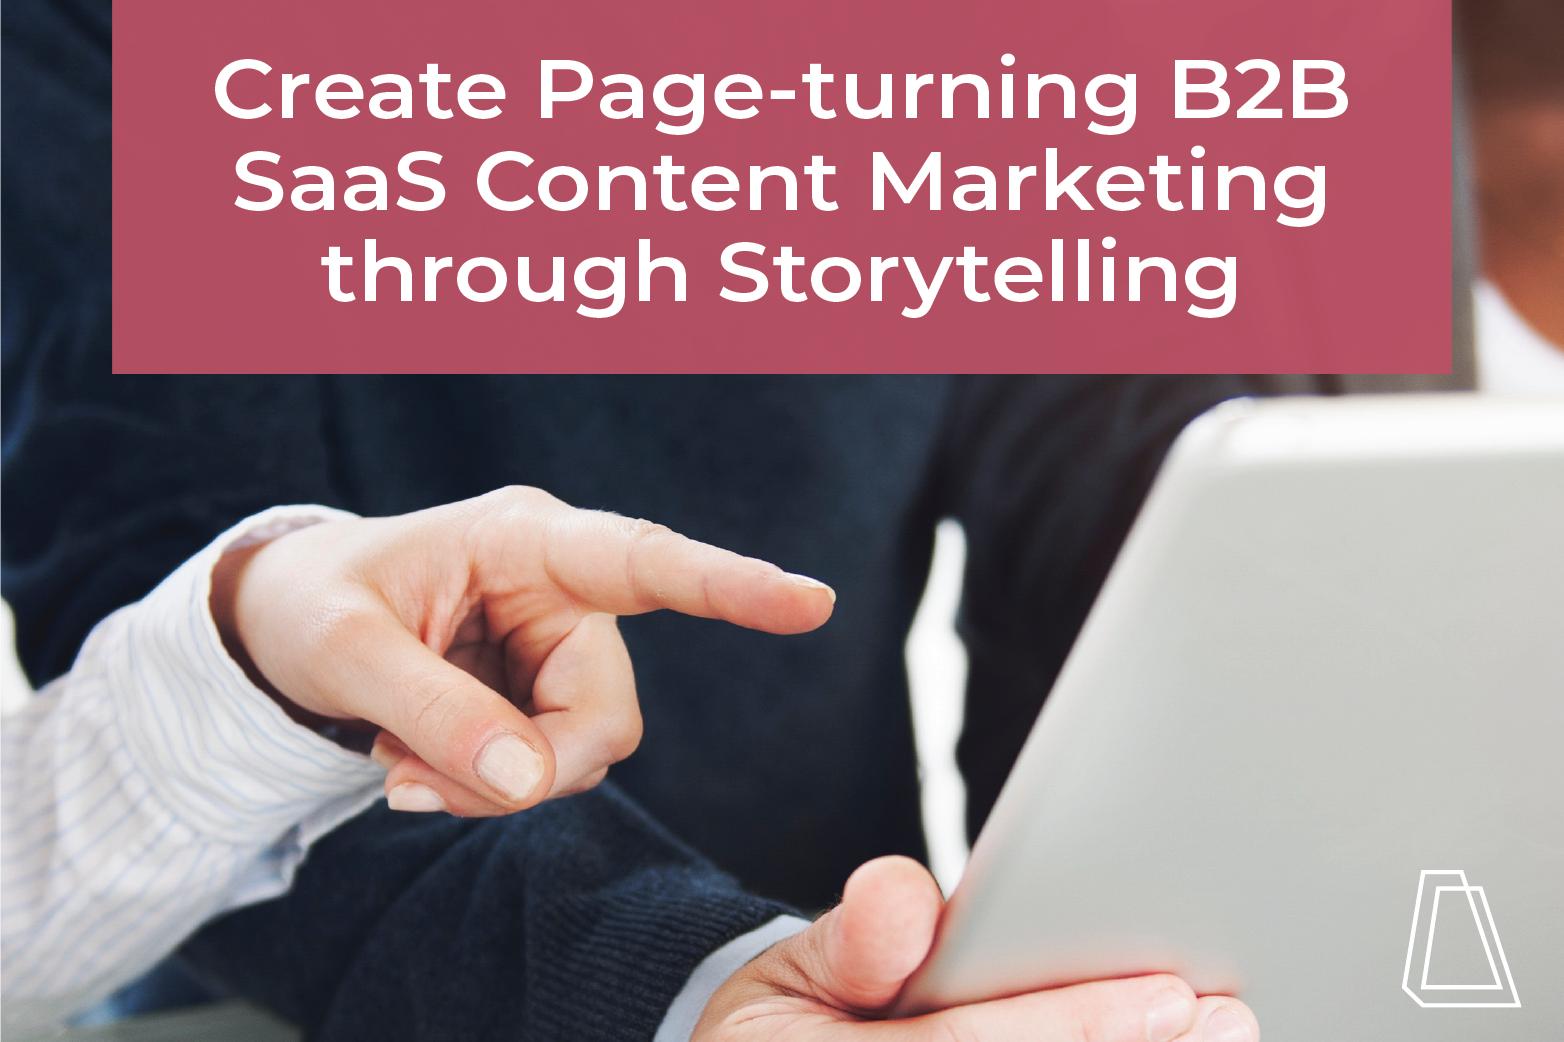 create page-turning b2b saas content marketing through  storytelling